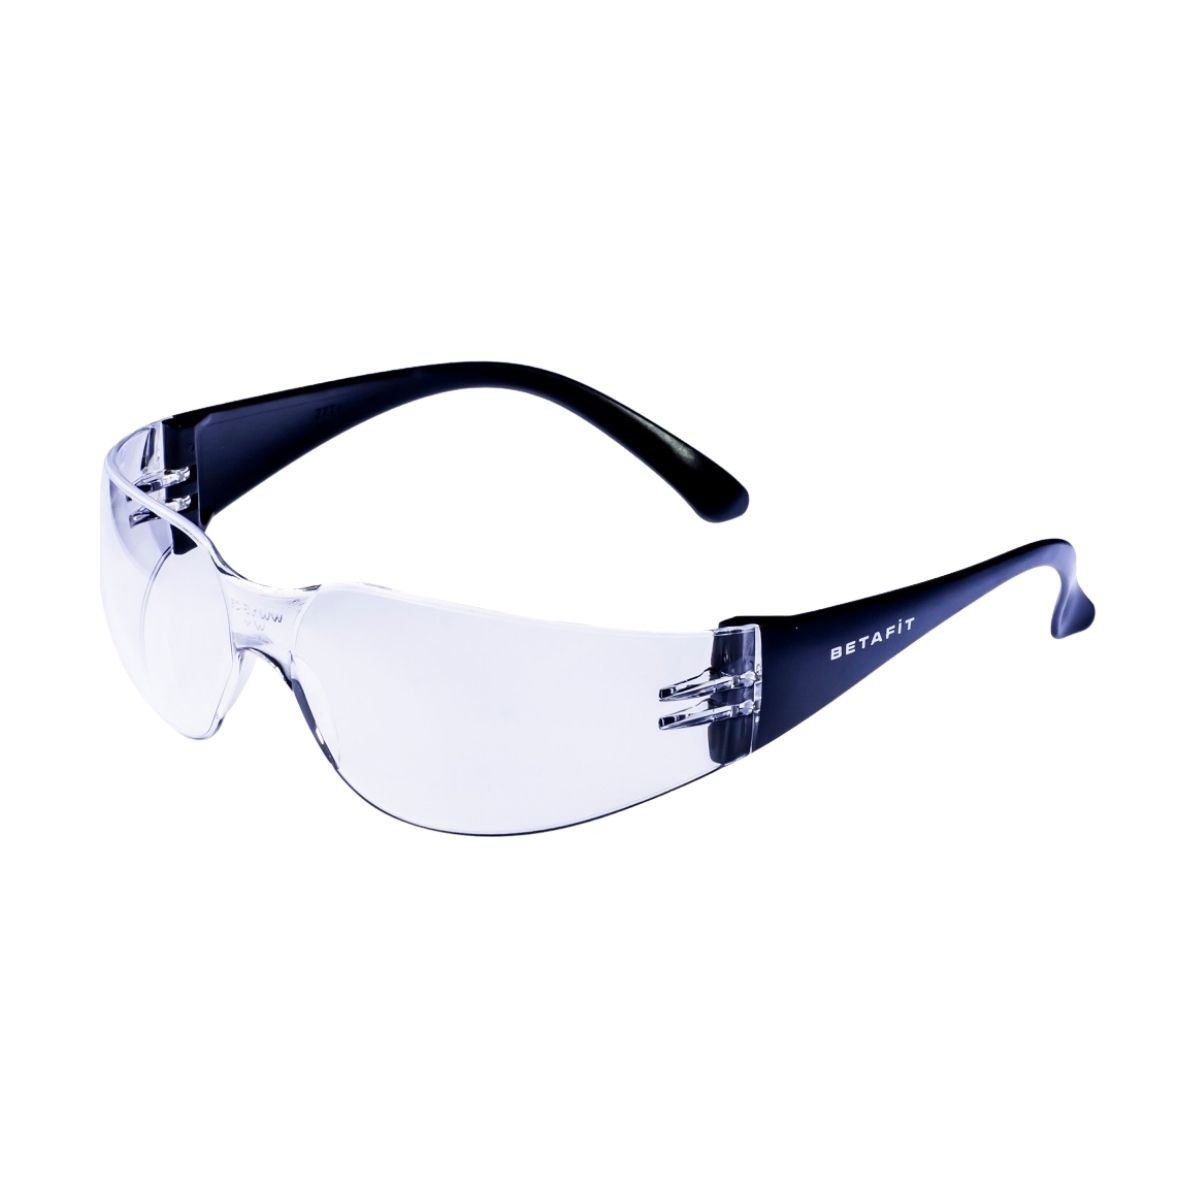 EW2101 Geneva Sport Anti-Scratch Safety Glasses